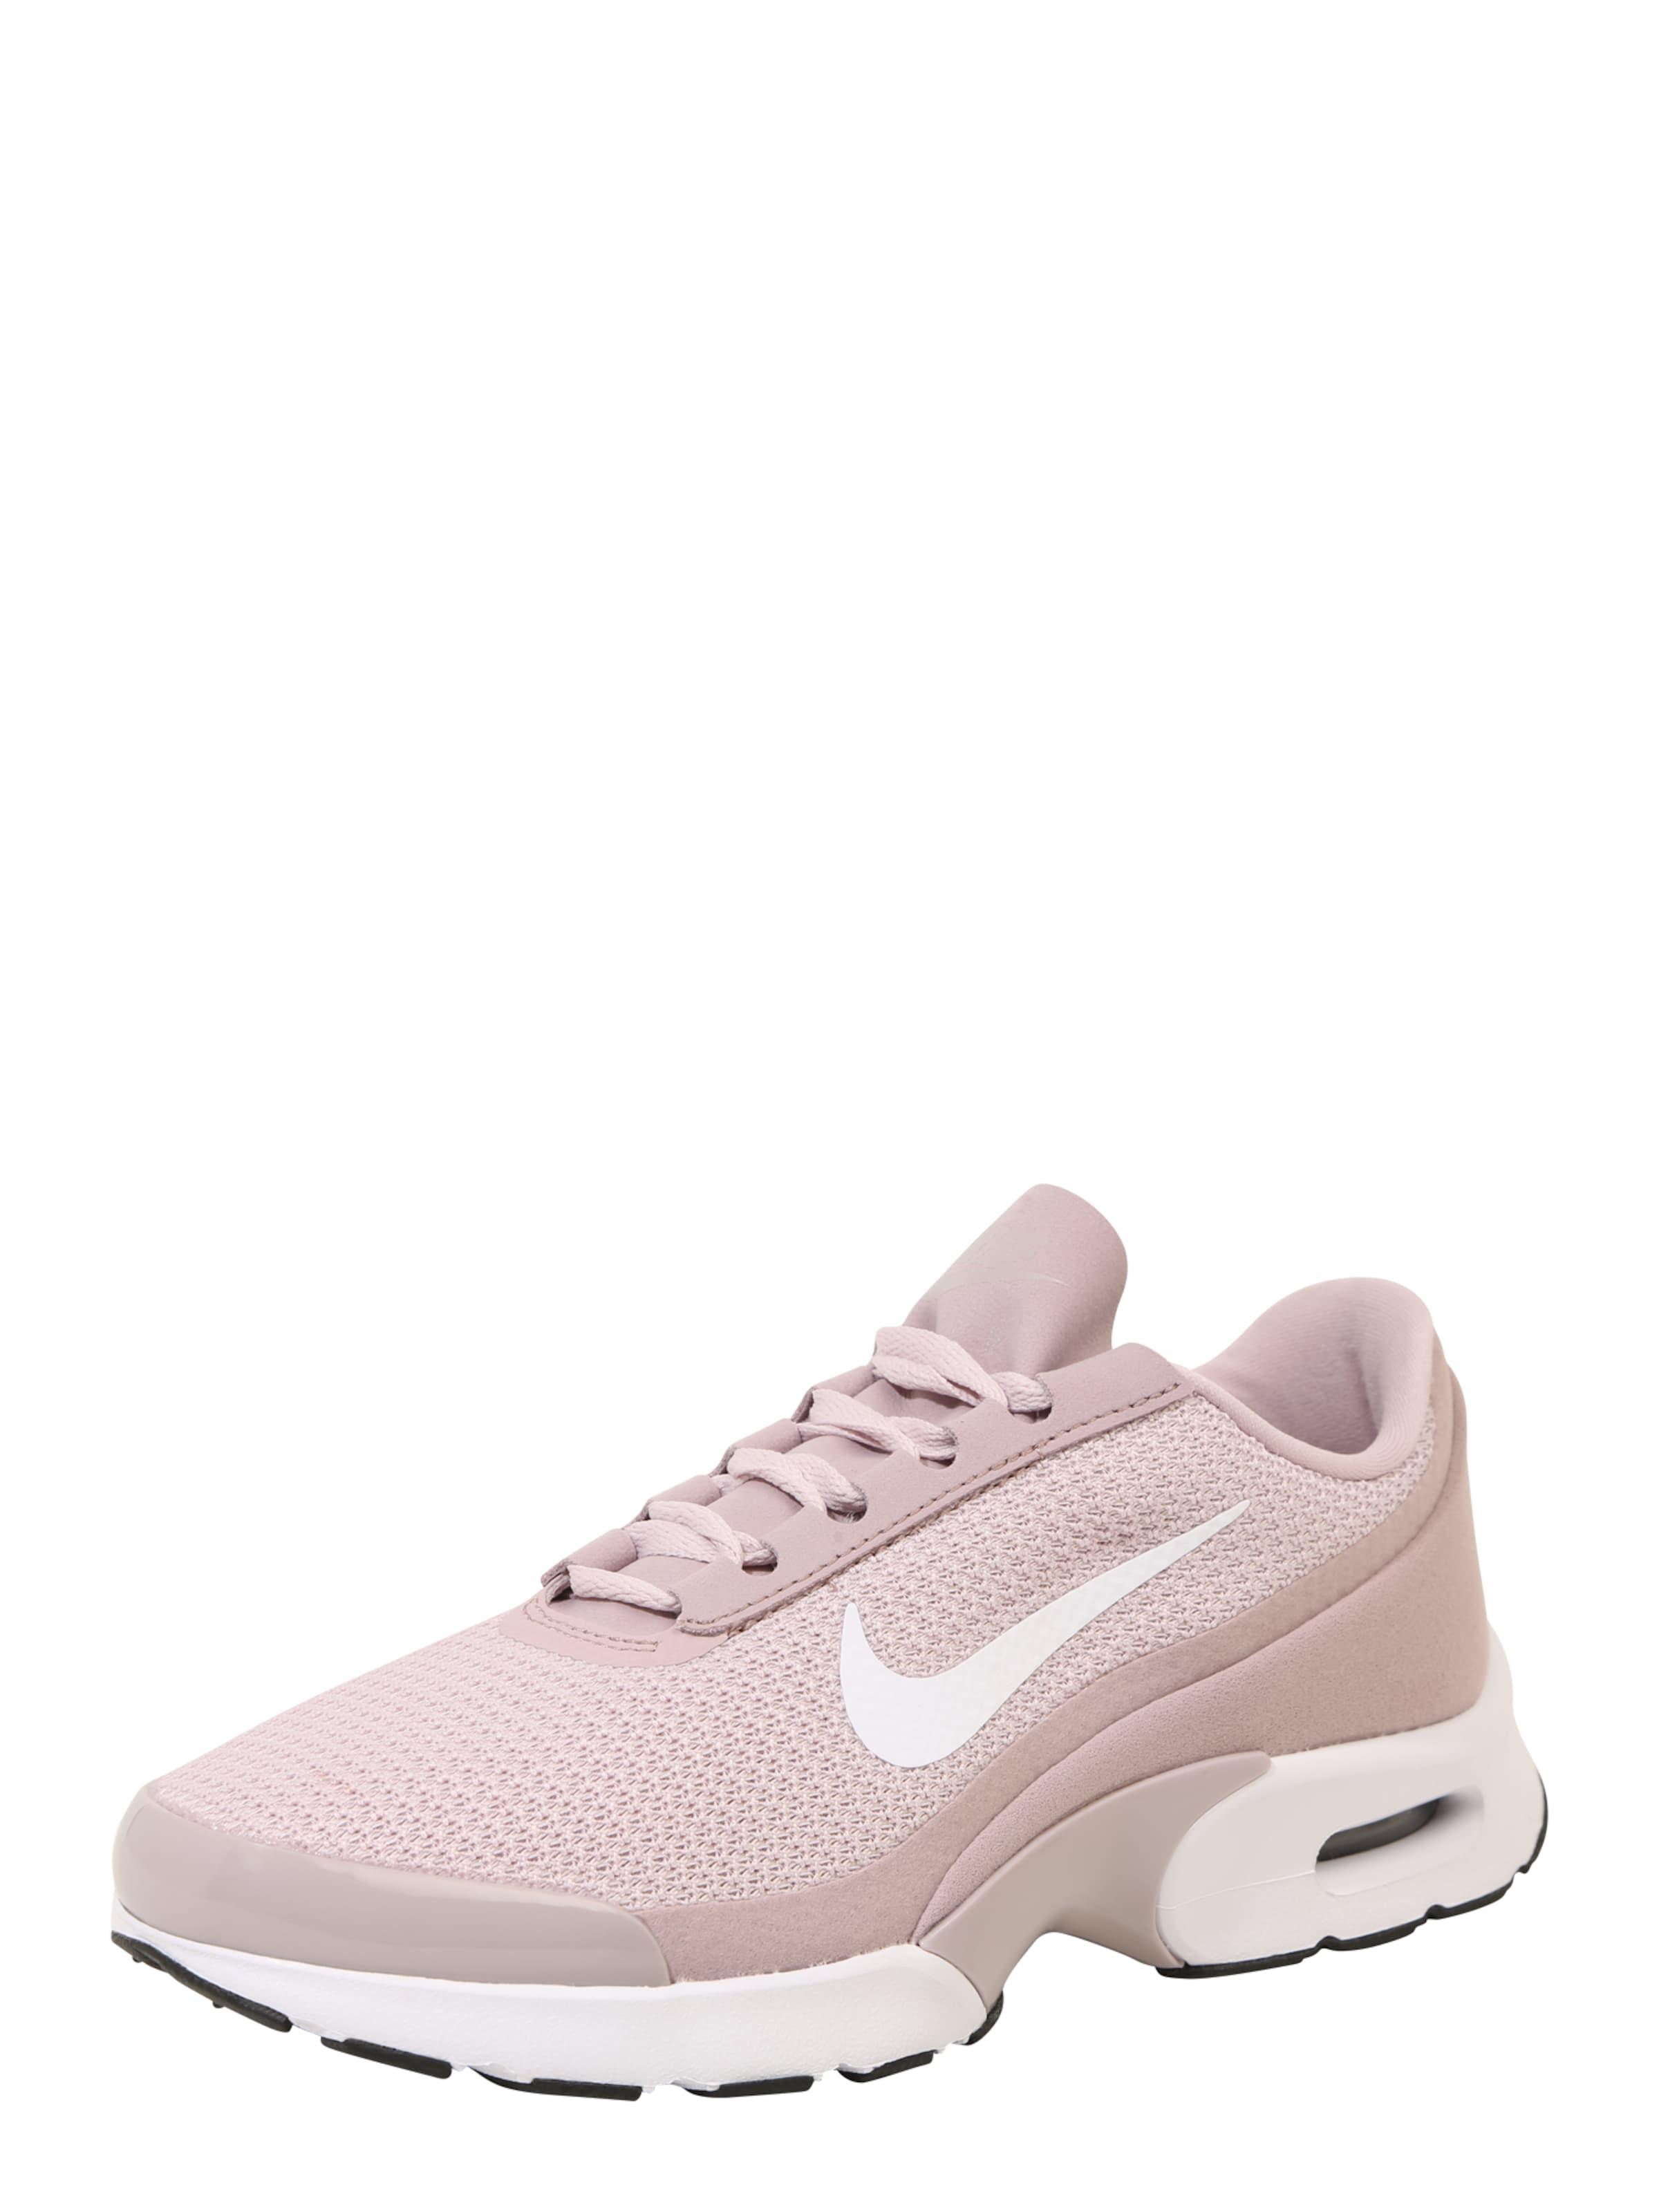 Nu 15% Korting: Baskets Nike Sportswear »mouvement Air Max Pv« P4K0jjBrz